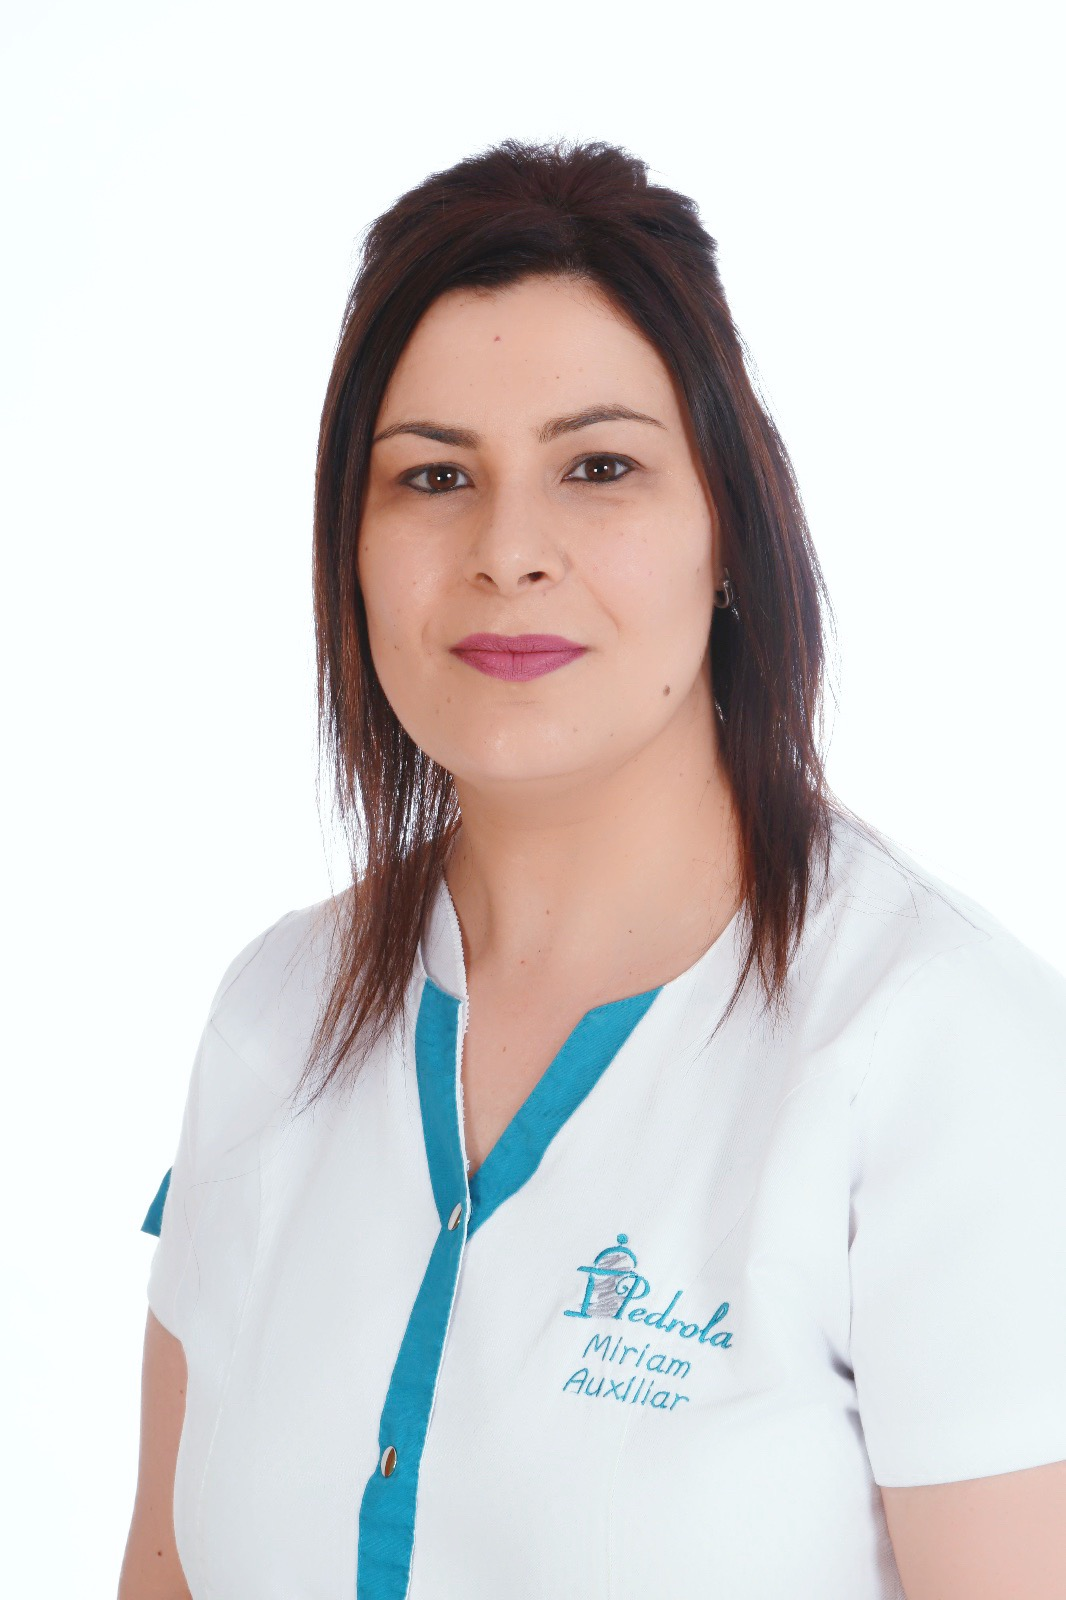 Miriam Gallart Figueres